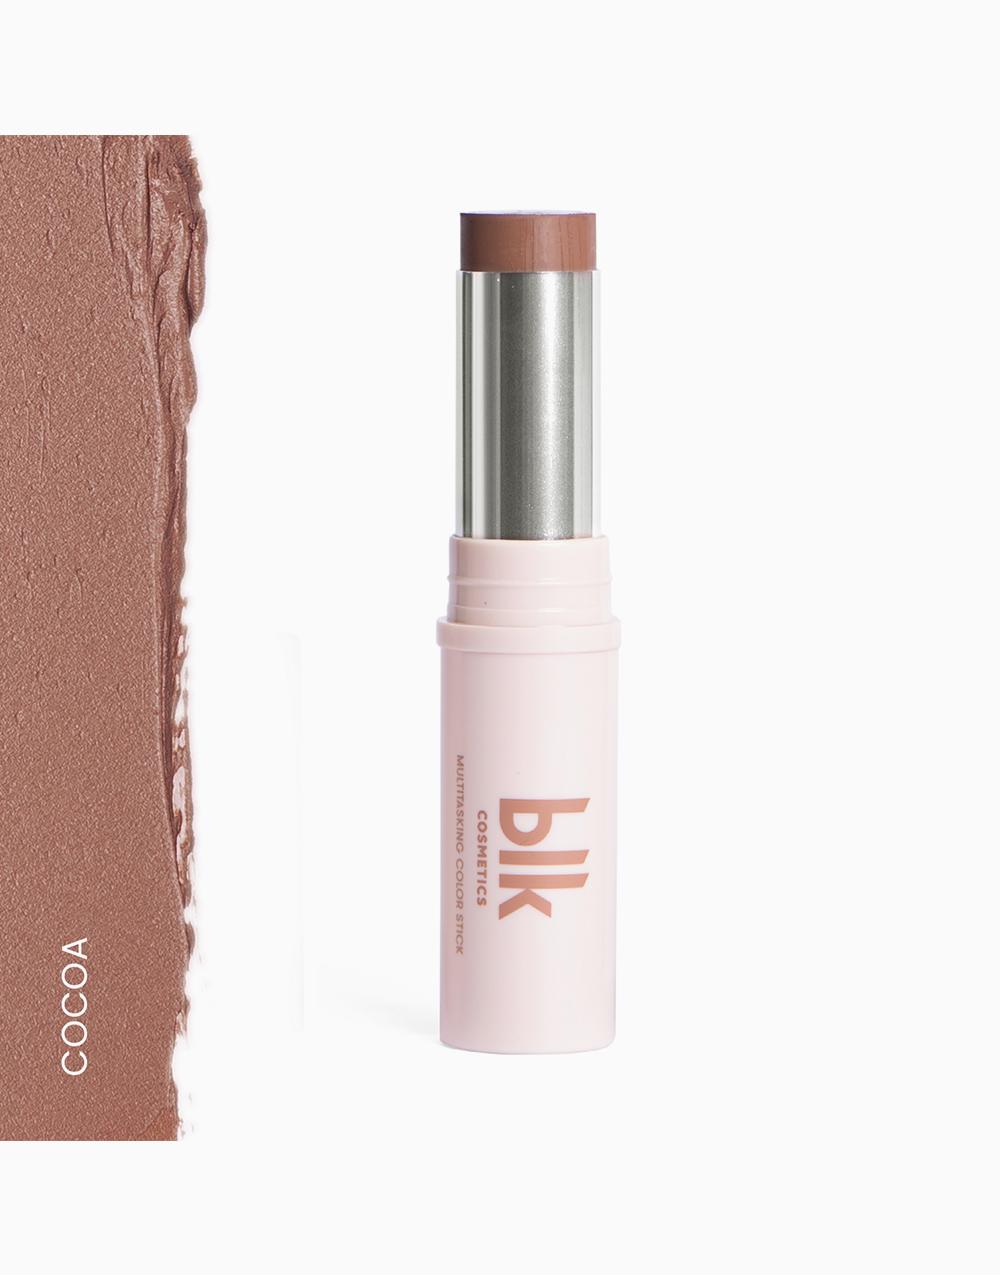 Multi-Tasking Color Stick by BLK Cosmetics | Cocoa